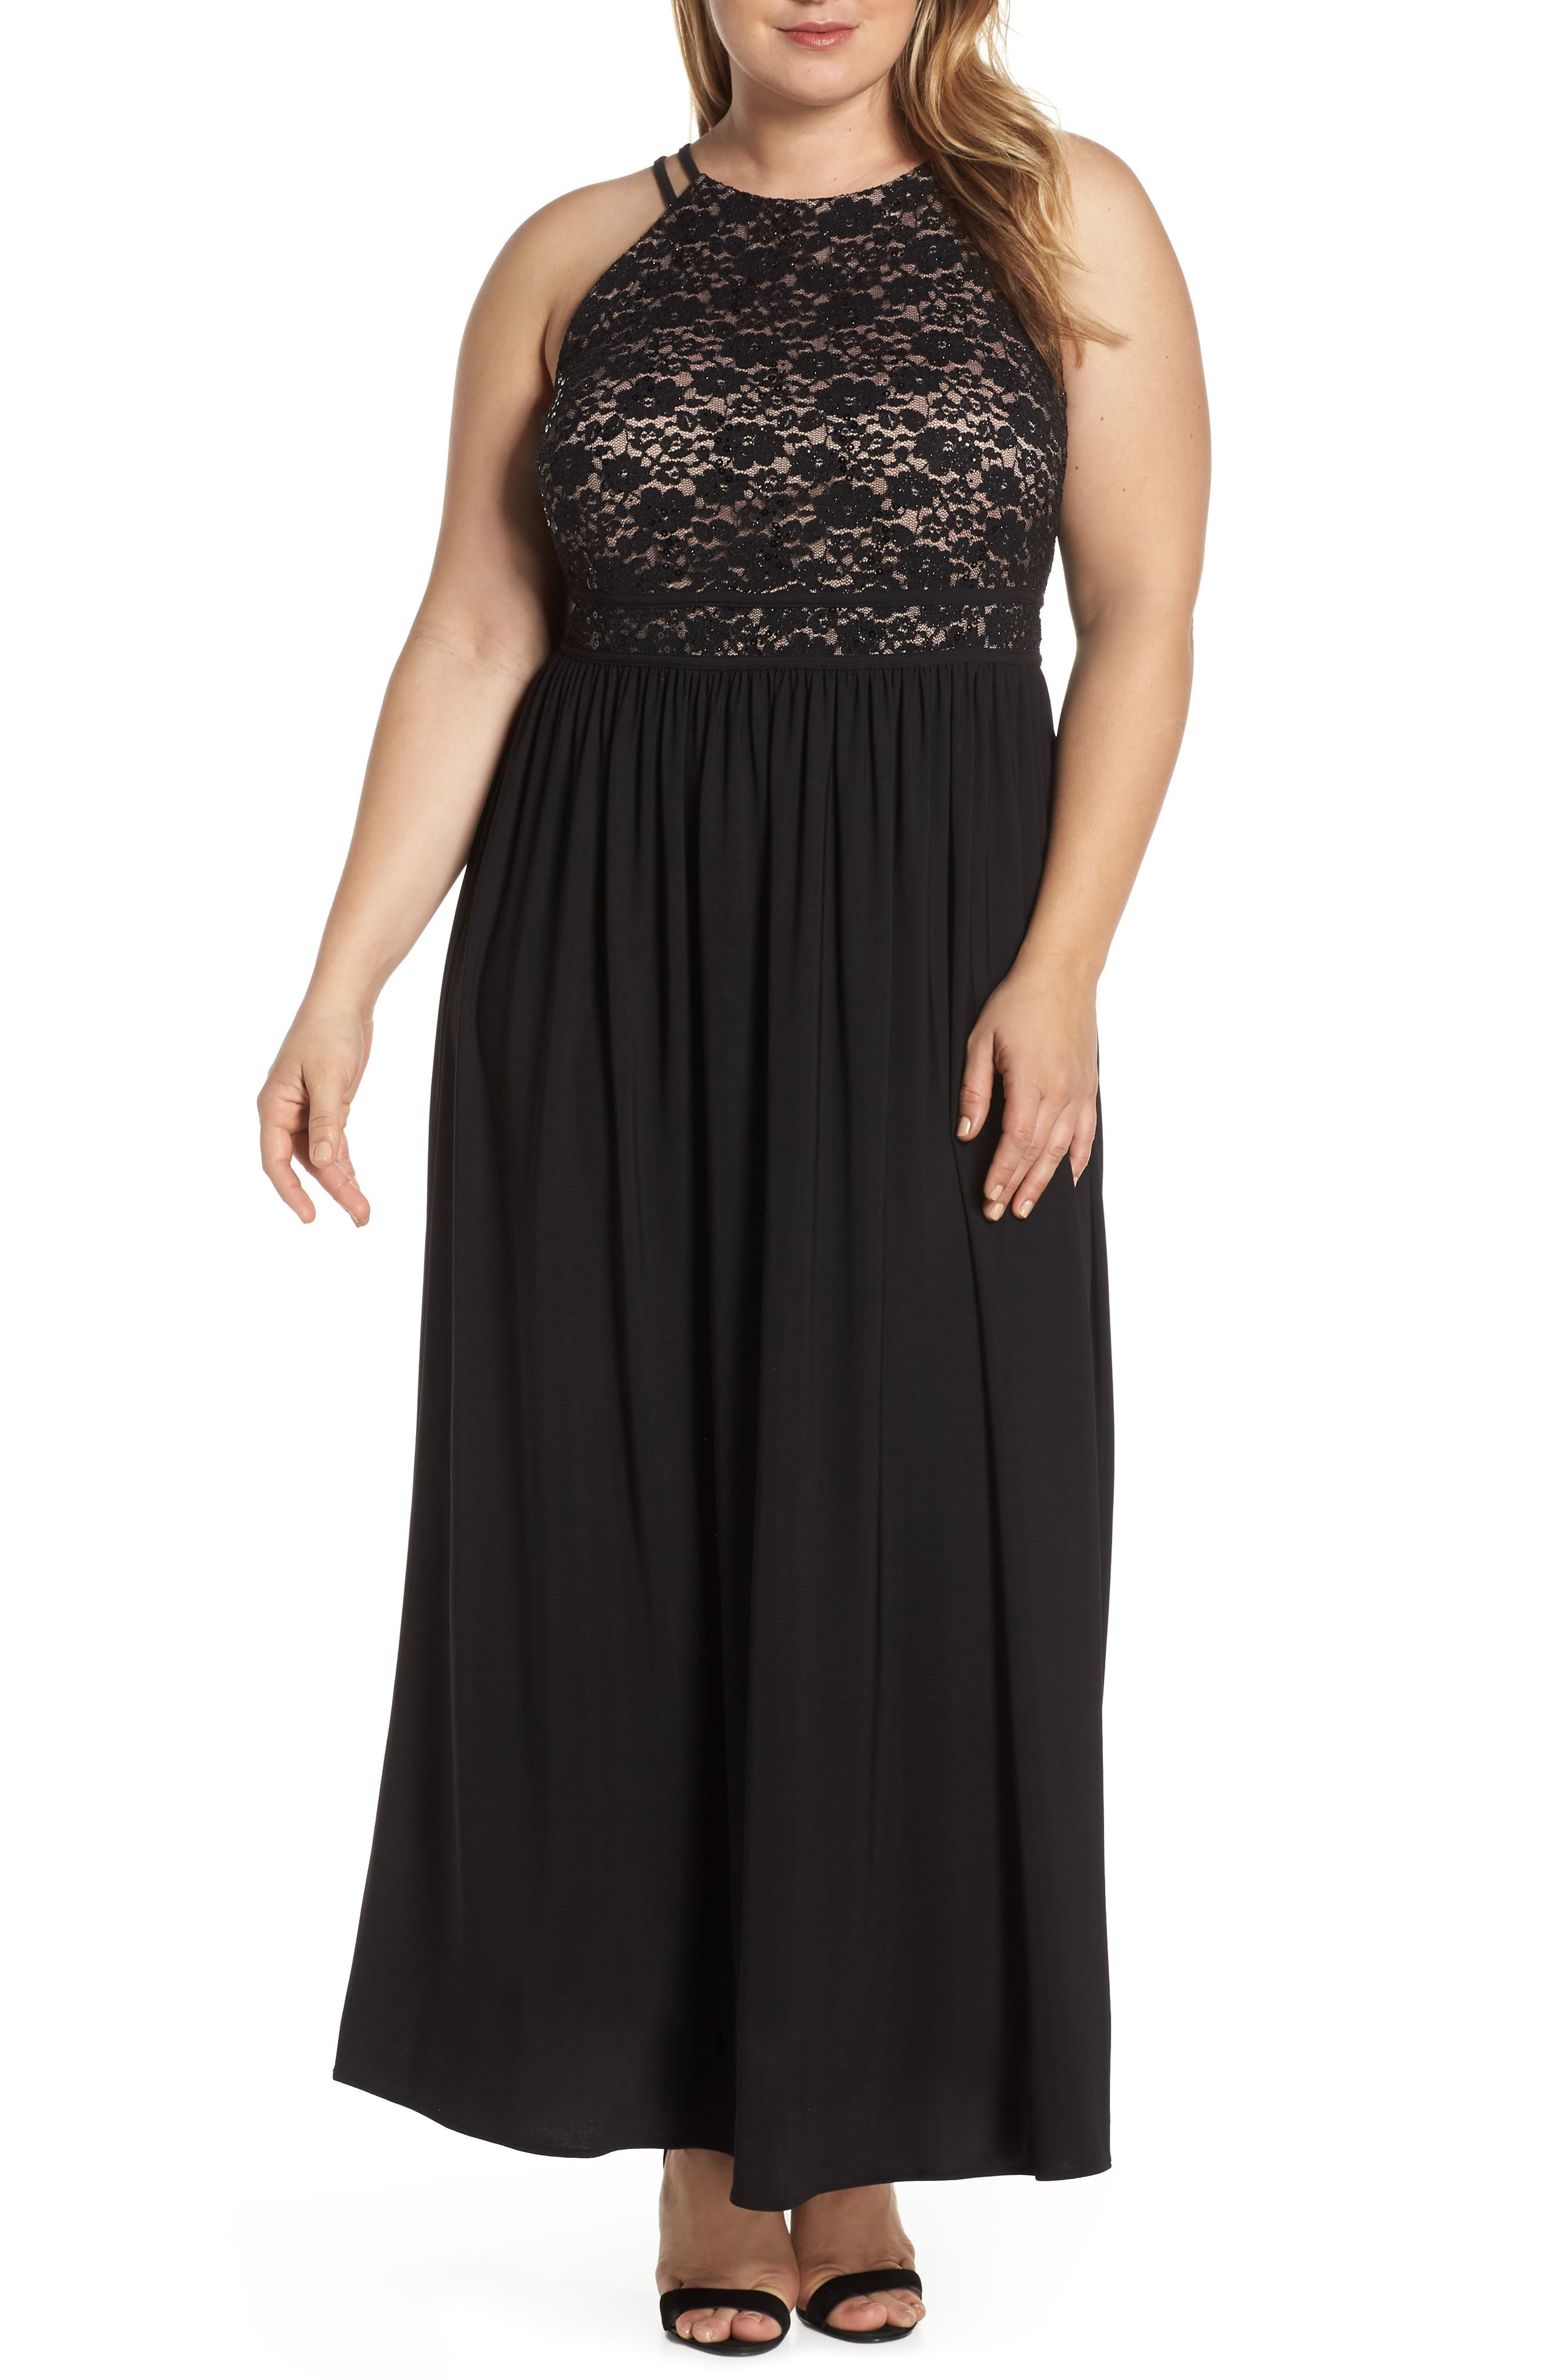 Plus Size Morgan & Co. Lace Bodice Evening Dress, Black